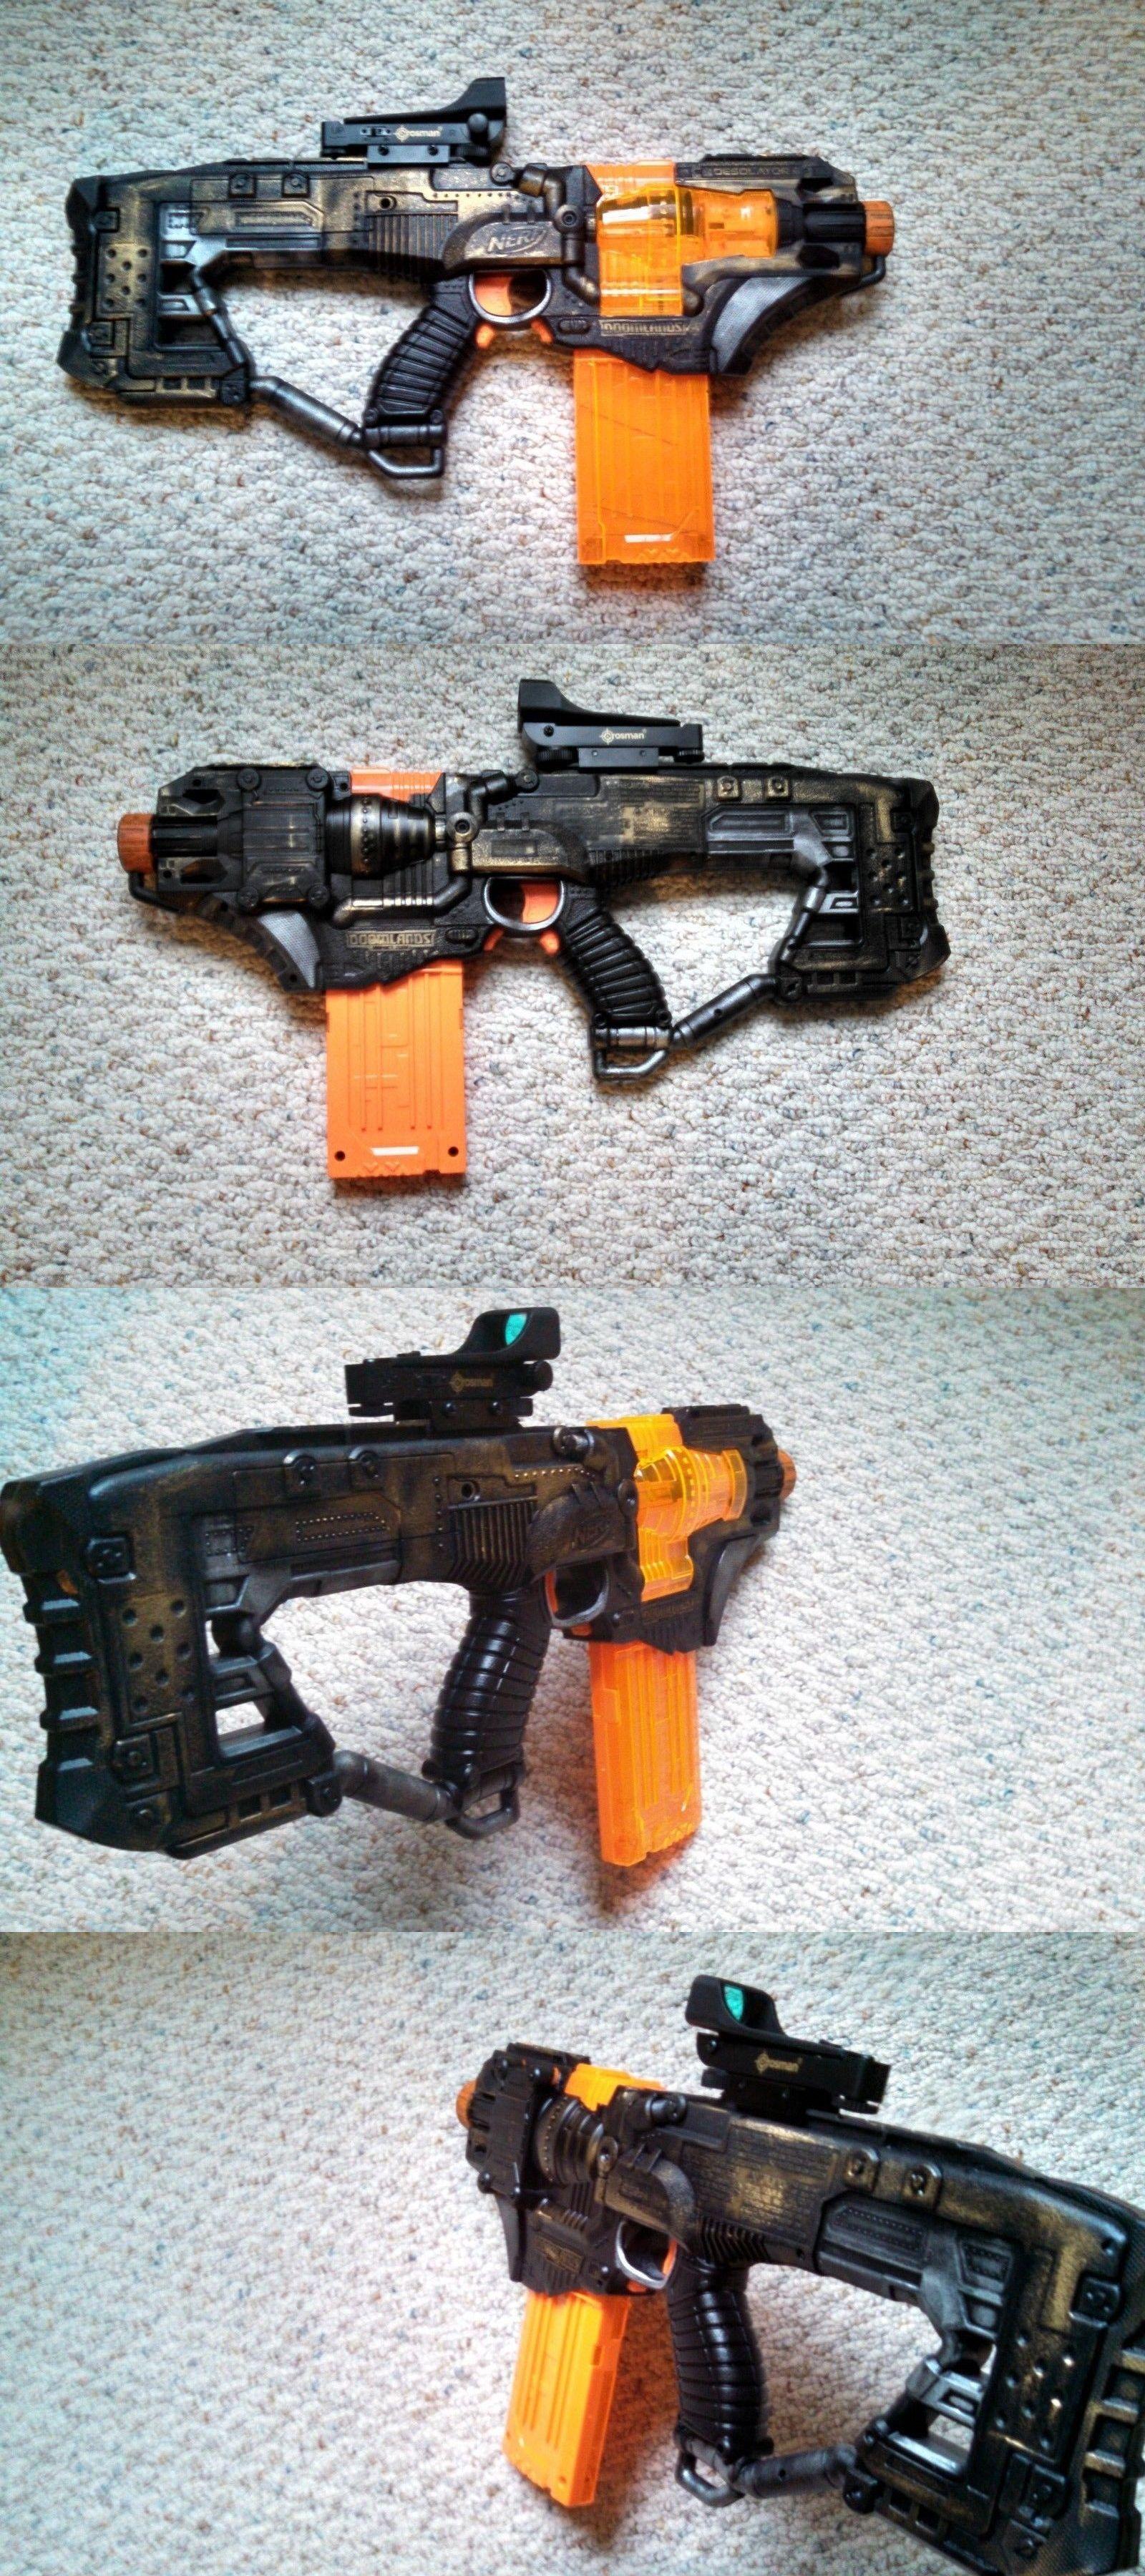 Dart Guns and Soft Darts 158749: Highly Modified Steampunk Nerf Desolator  -> BUY IT